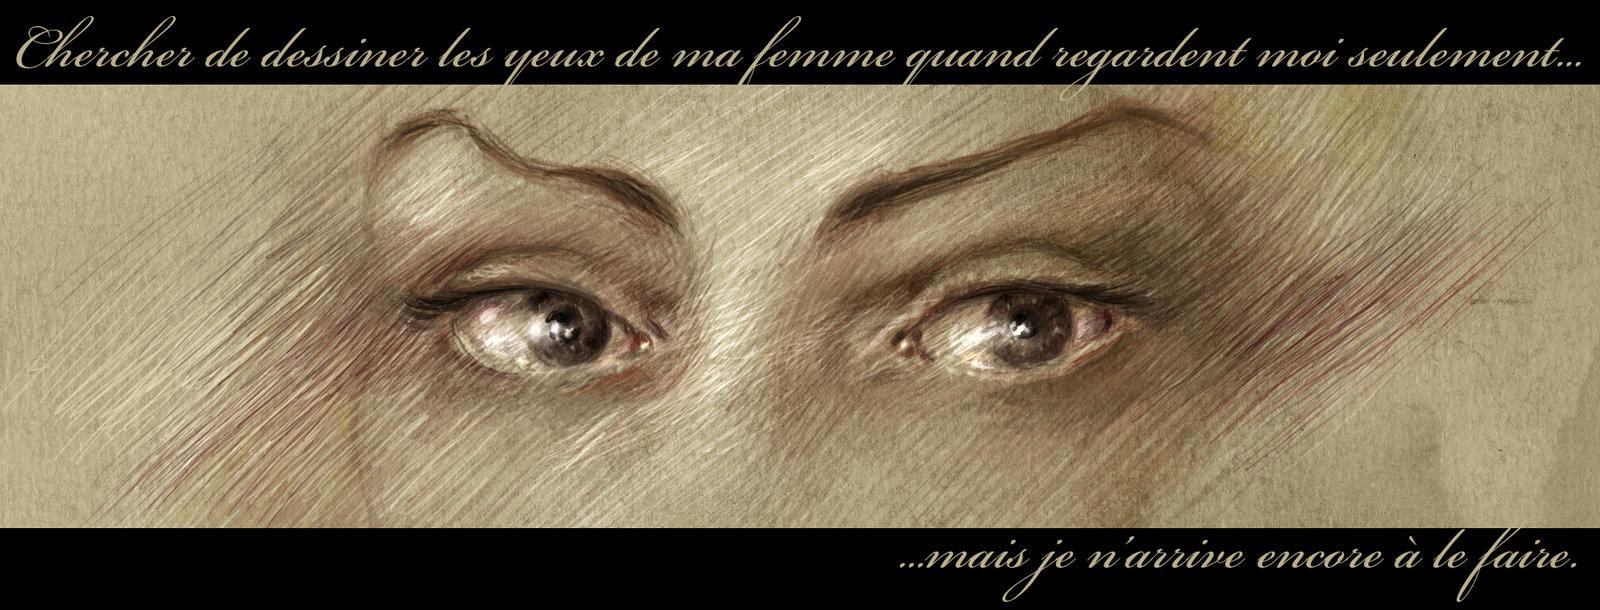 5 Le bonheur.jpg